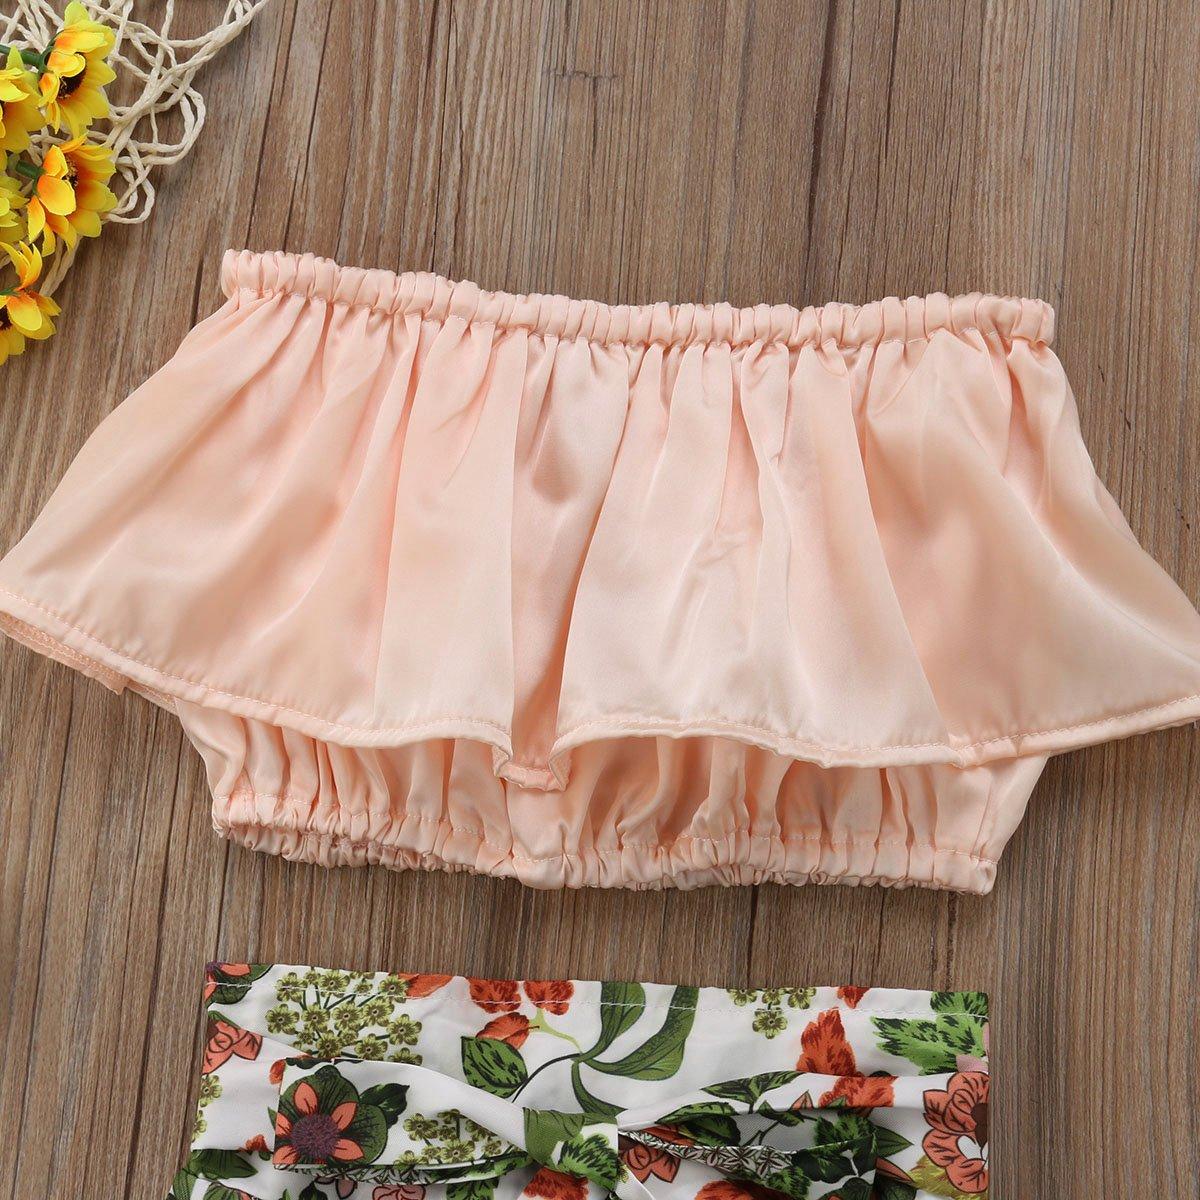 Wide Leg Flower Pants 2PCS Outfit Set 2-7T Toddler Kids Girls Cute Off Shoulder Tube Vest Top